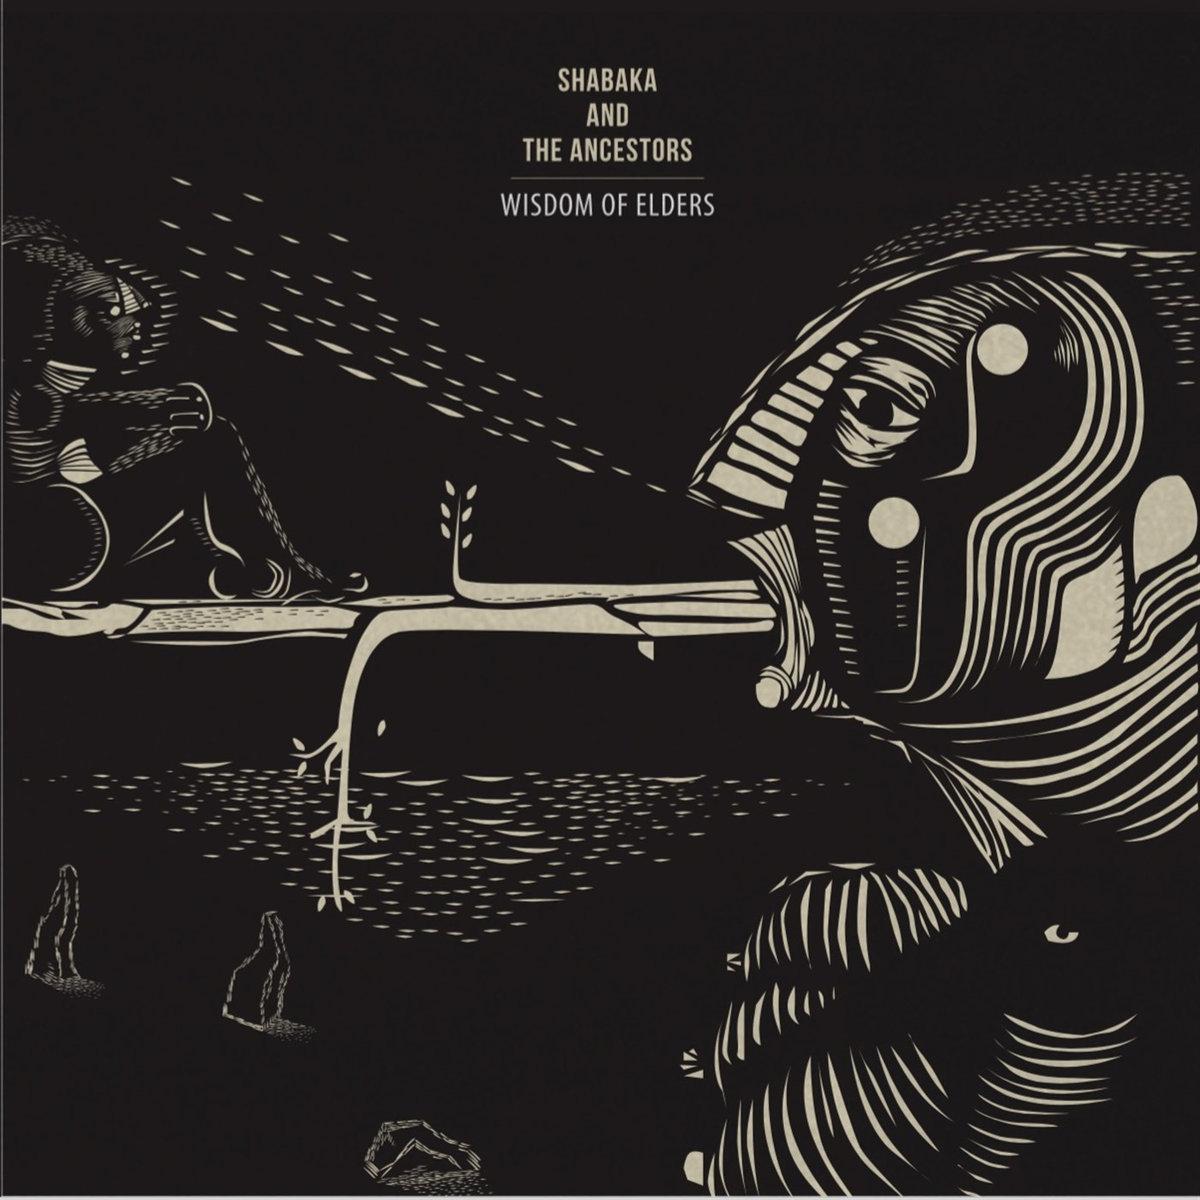 SHABAKA AND THE ANCESTORS - WISDOM OF ELDERS (BROWNSWOOD RECORDINGS, 2016)